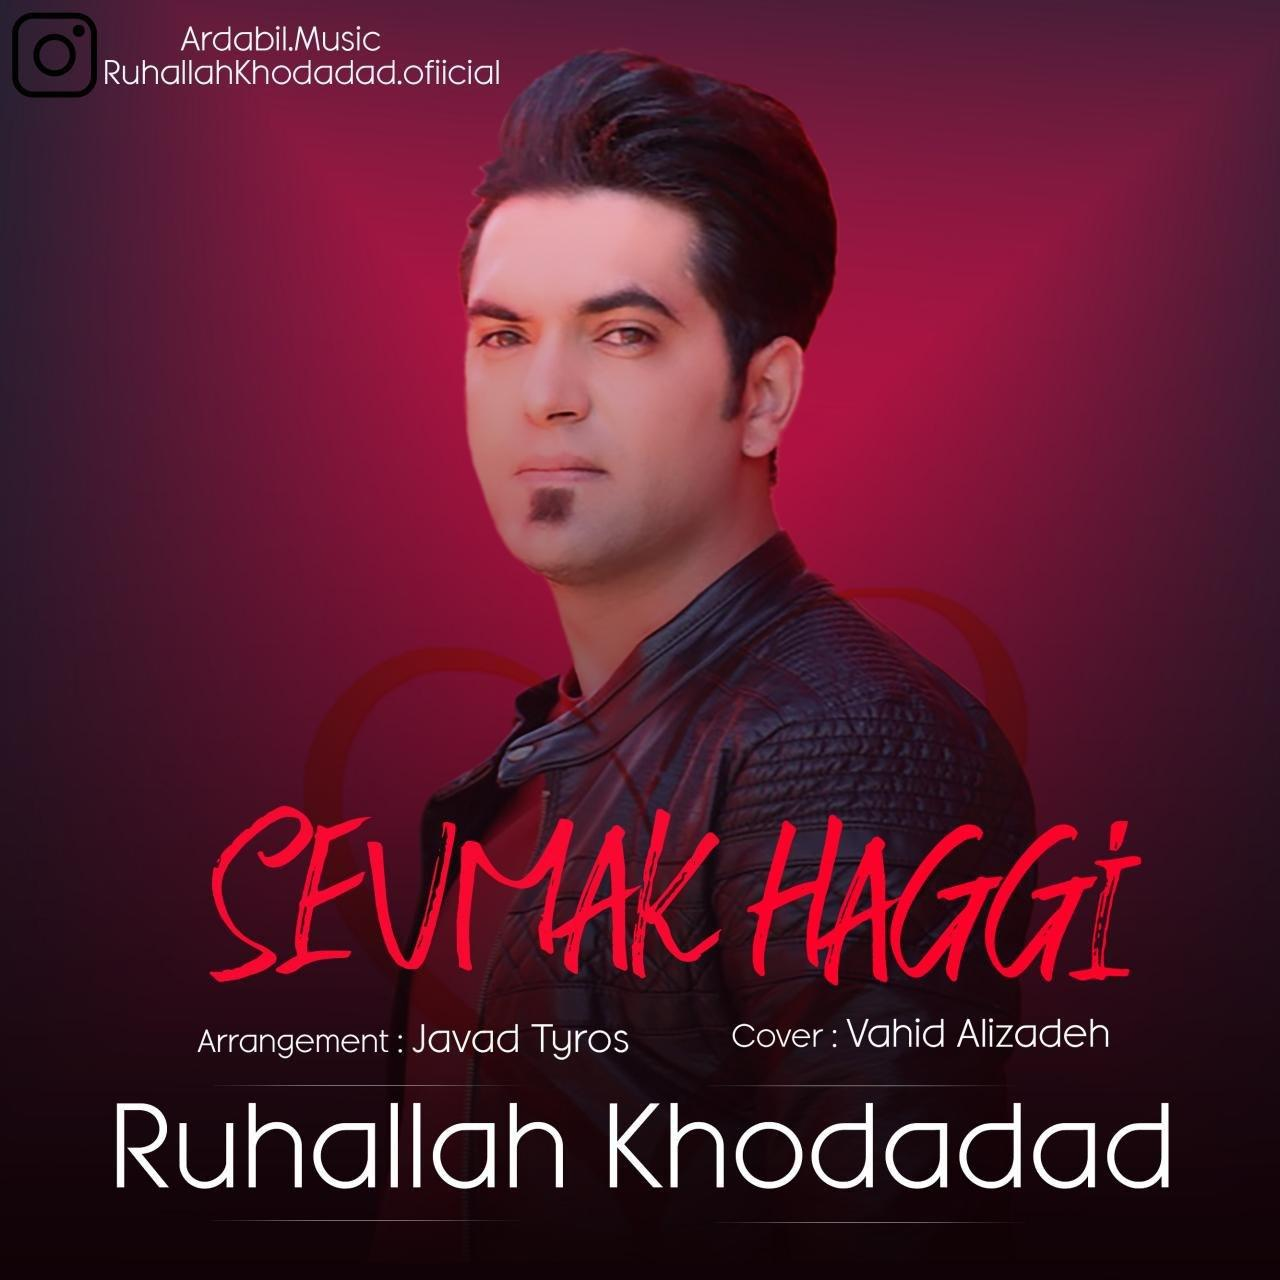 http://s5.picofile.com/file/8396785426/13Ruhallah_Khodadad_Sevmak_Haggi.jpg